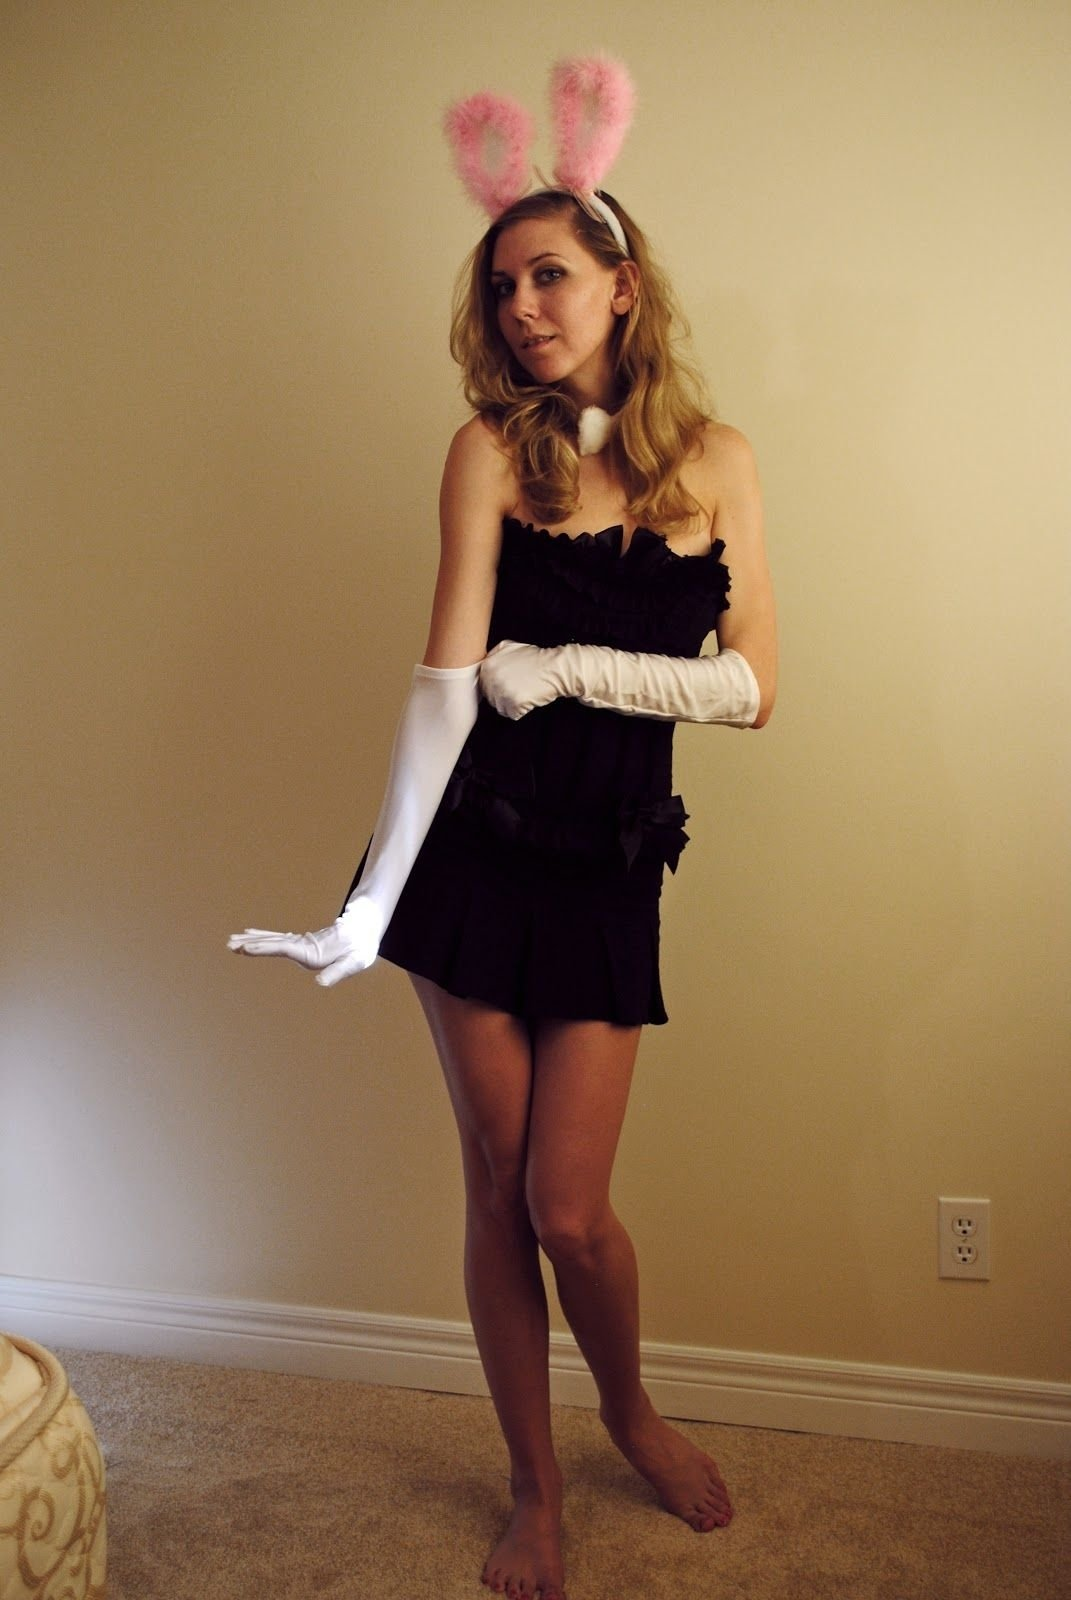 10 Ideal Homemade Womens Halloween Costume Ideas fashion files diy halloween costume ideas costume ideas 2020